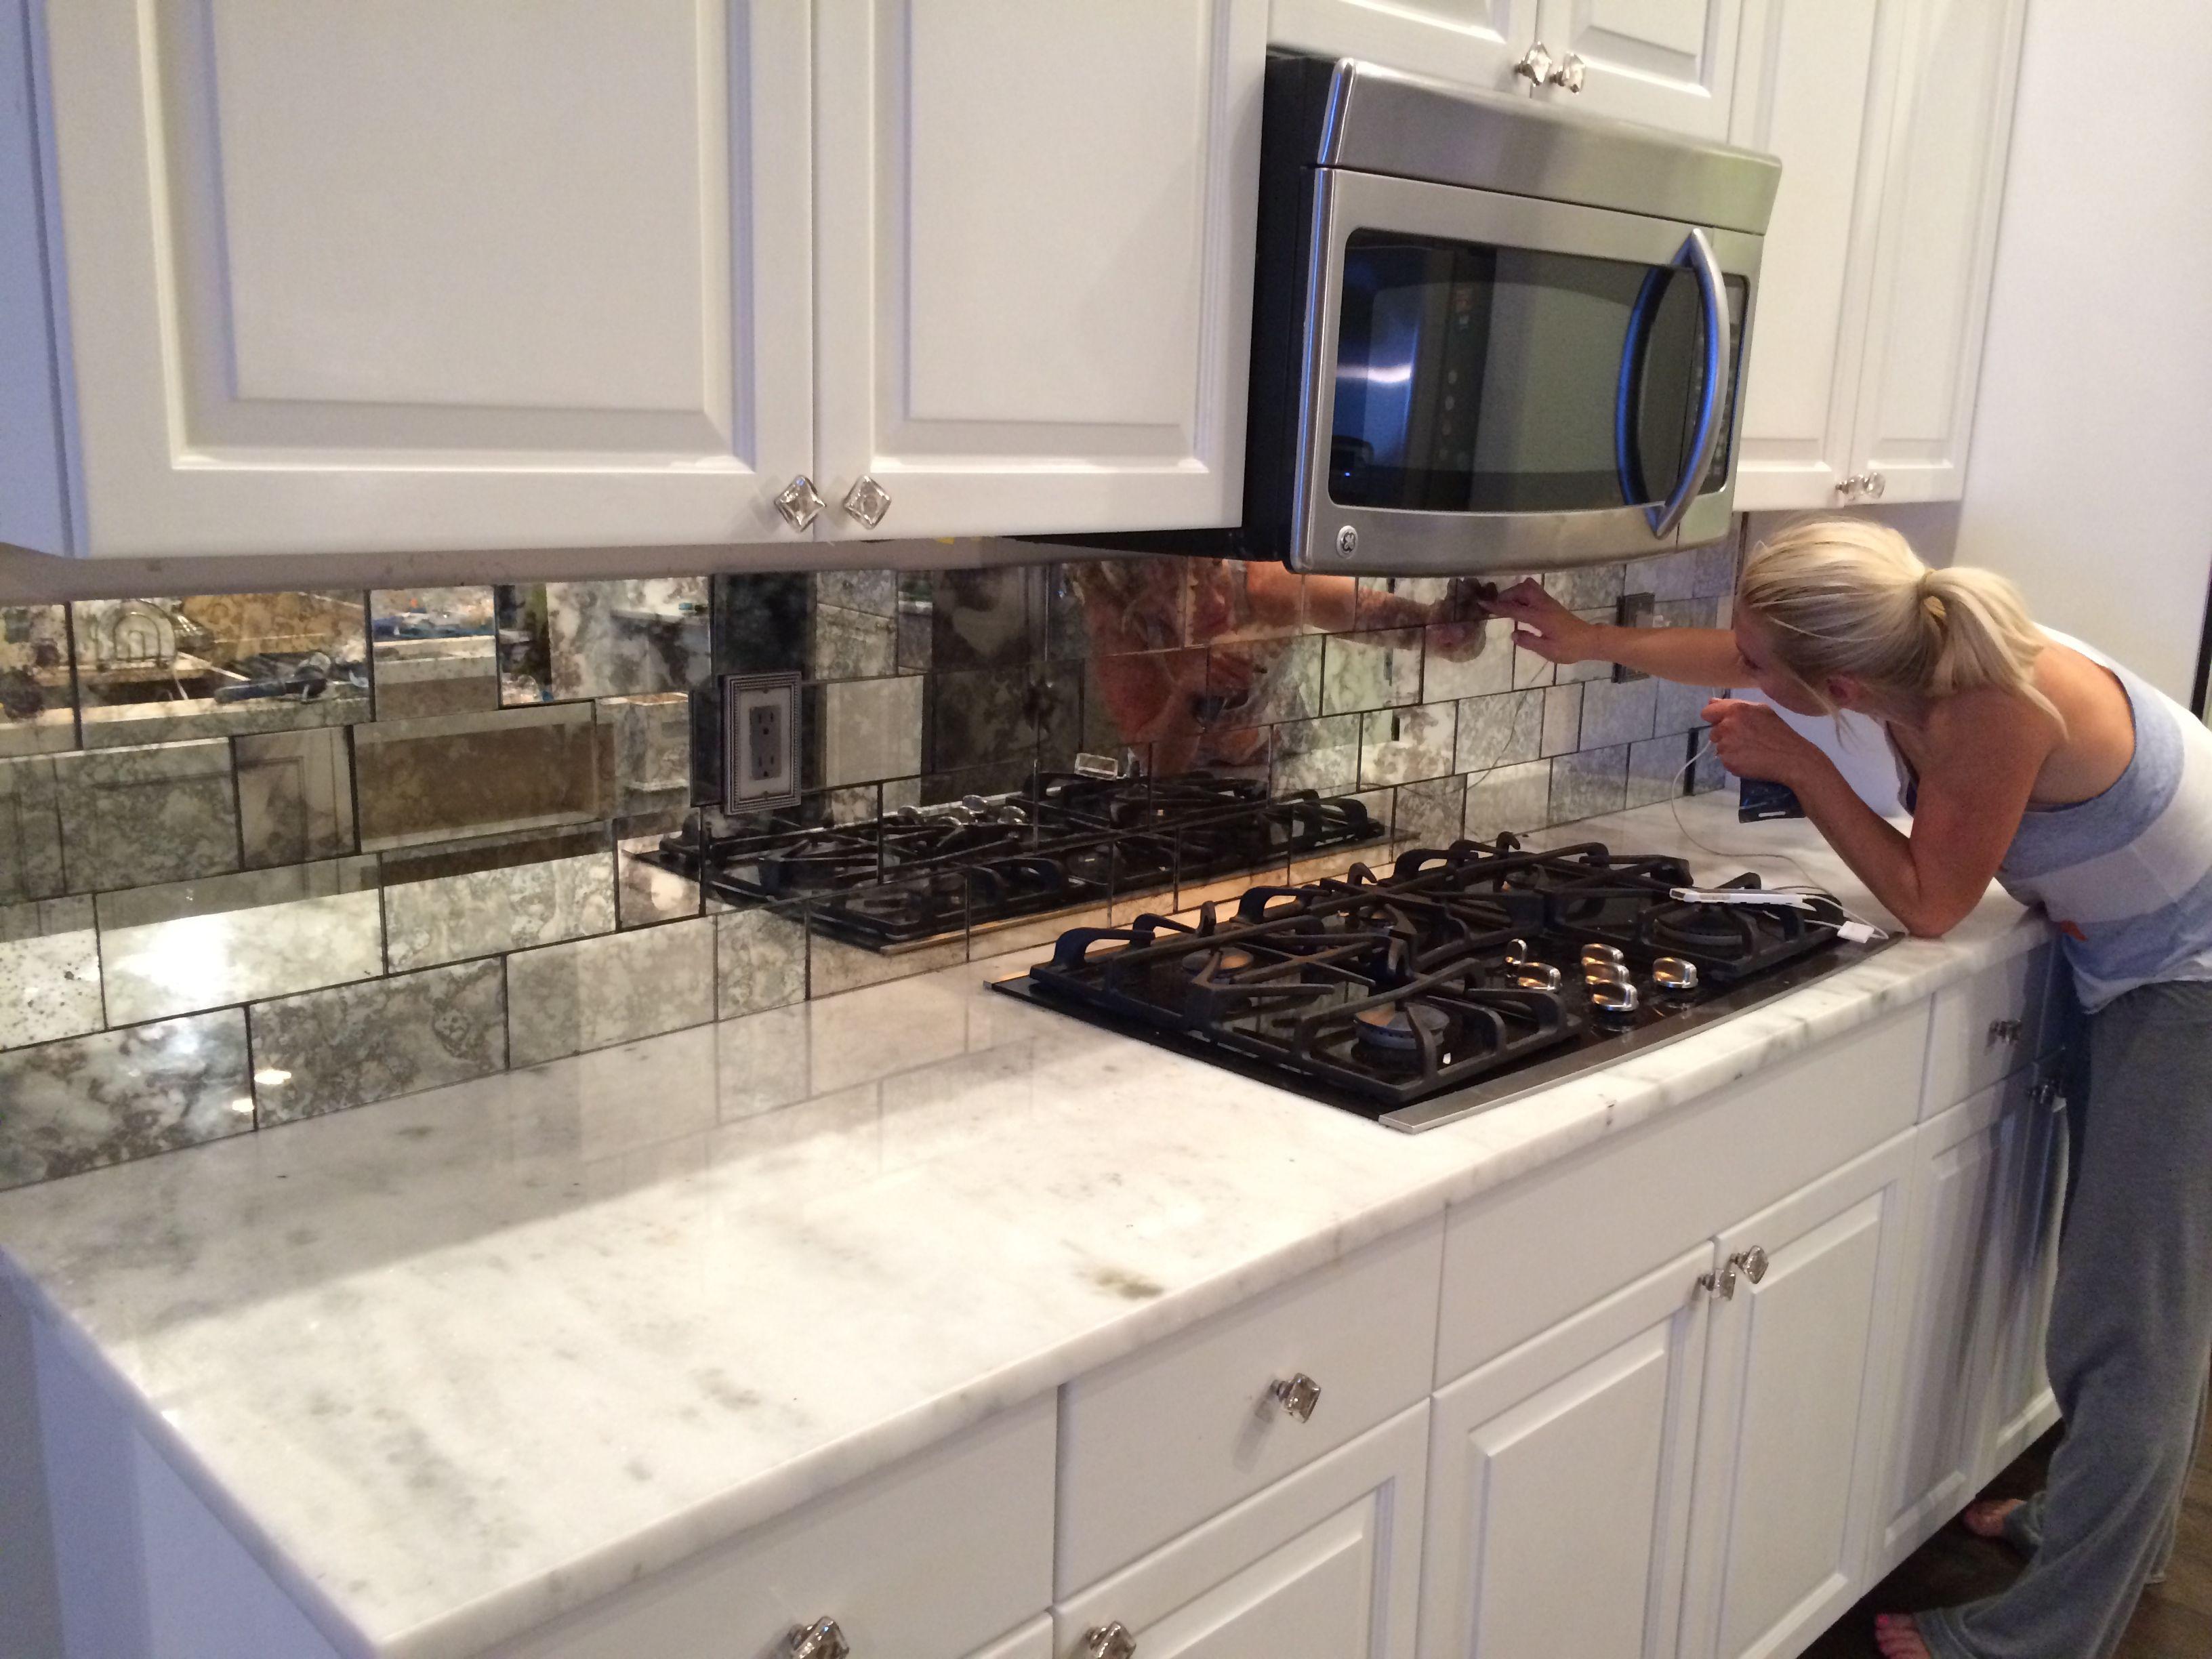 kitchen backsplash tiles mirror tile mirrored backsplash kitchen For the Home Pinterest Bar Tile and Love this